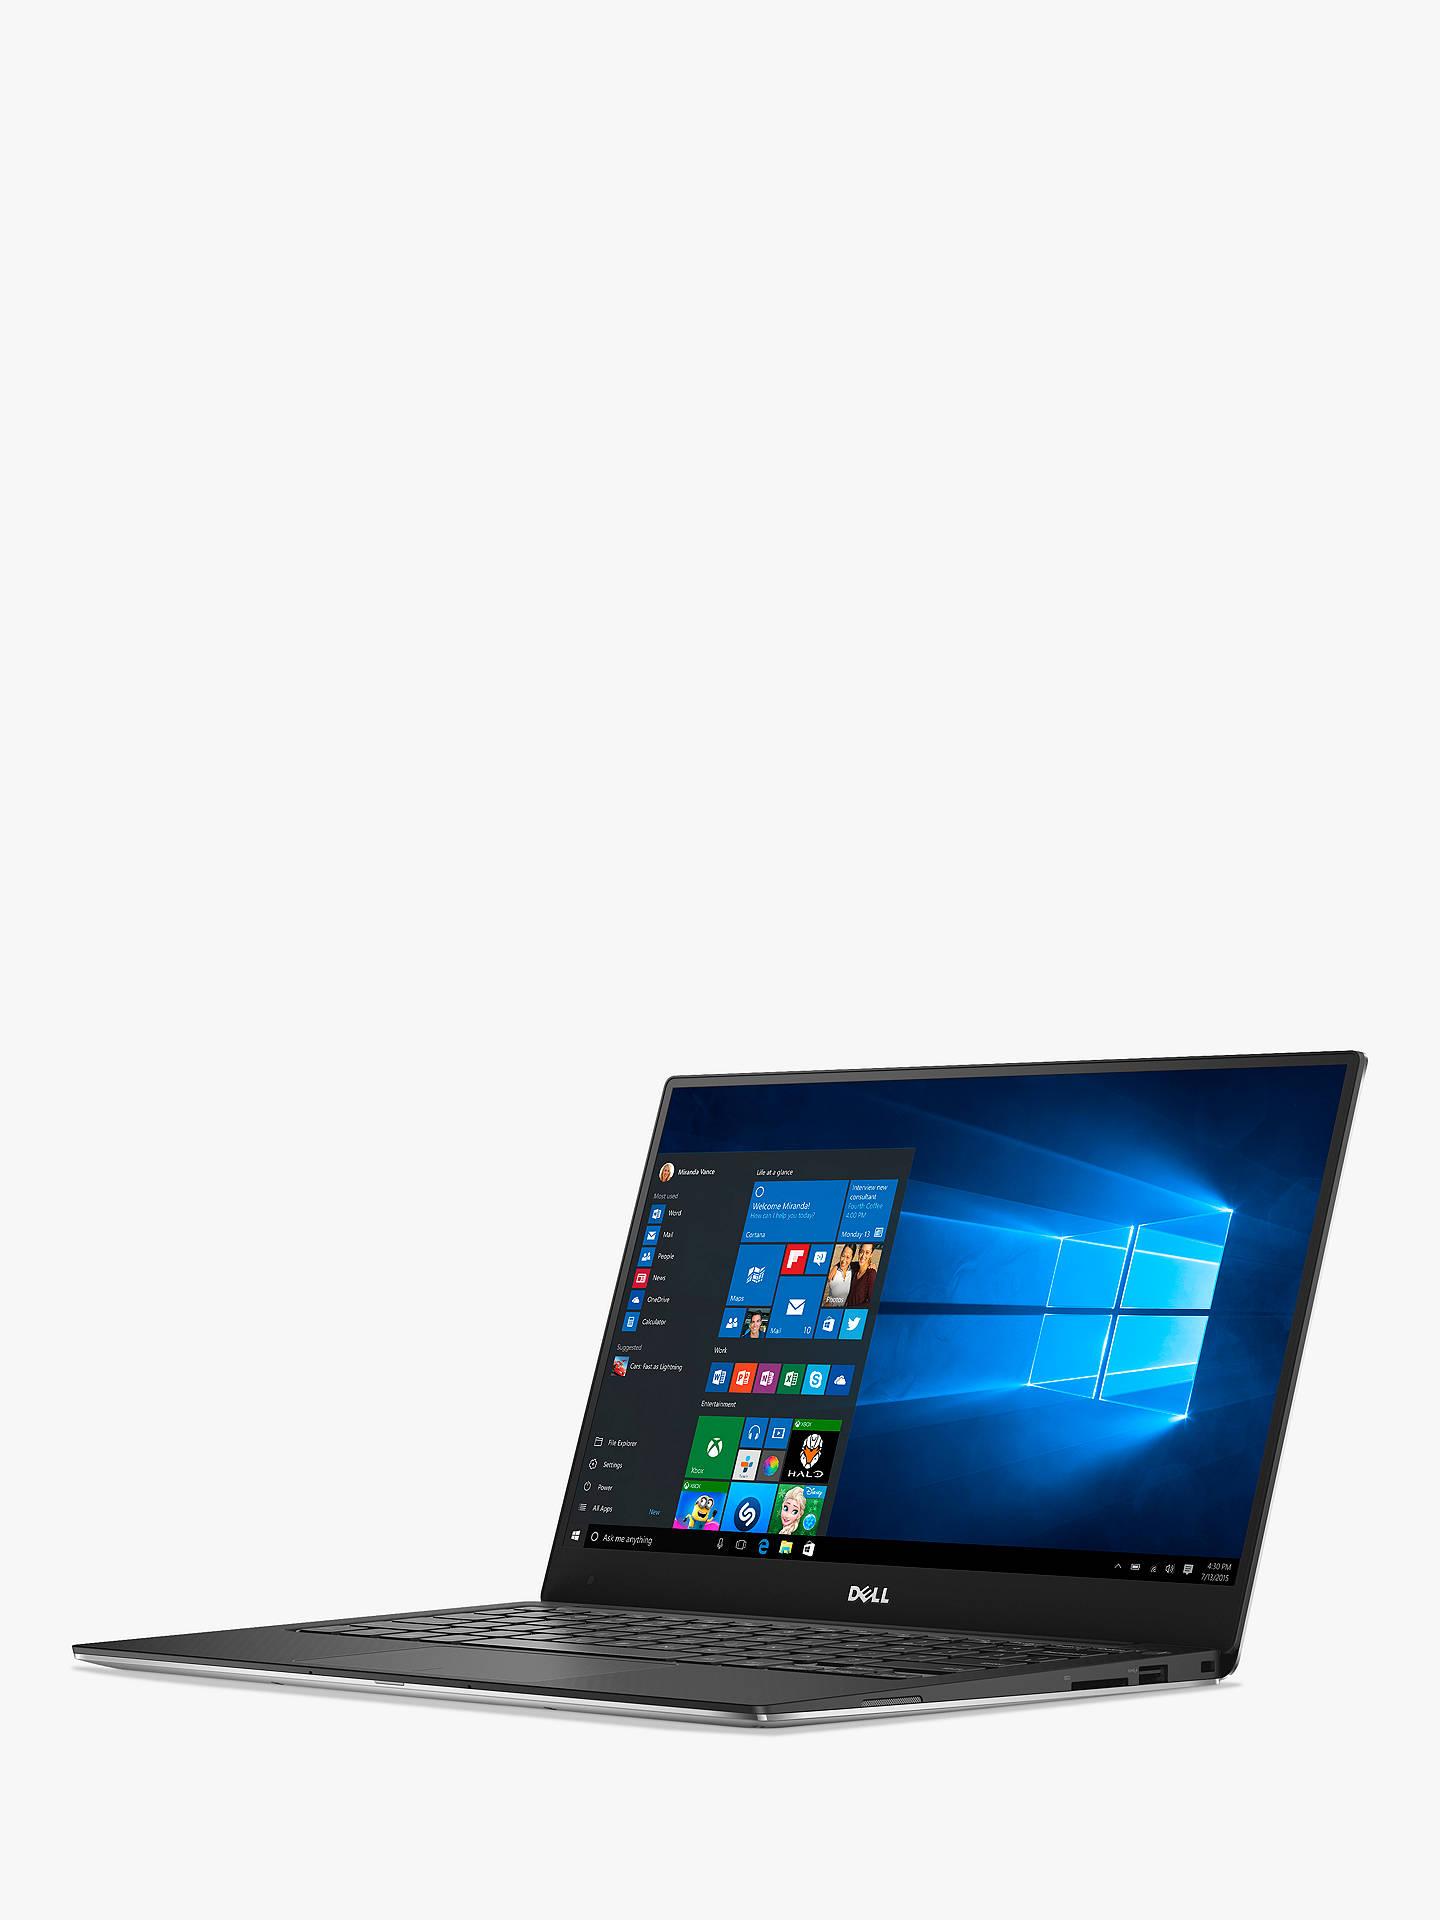 "Dell XPS 13 9360 Laptop, Intel Core i7, 8GB RAM, 256GB SSD, 13 3"", Full HD,  Silver"